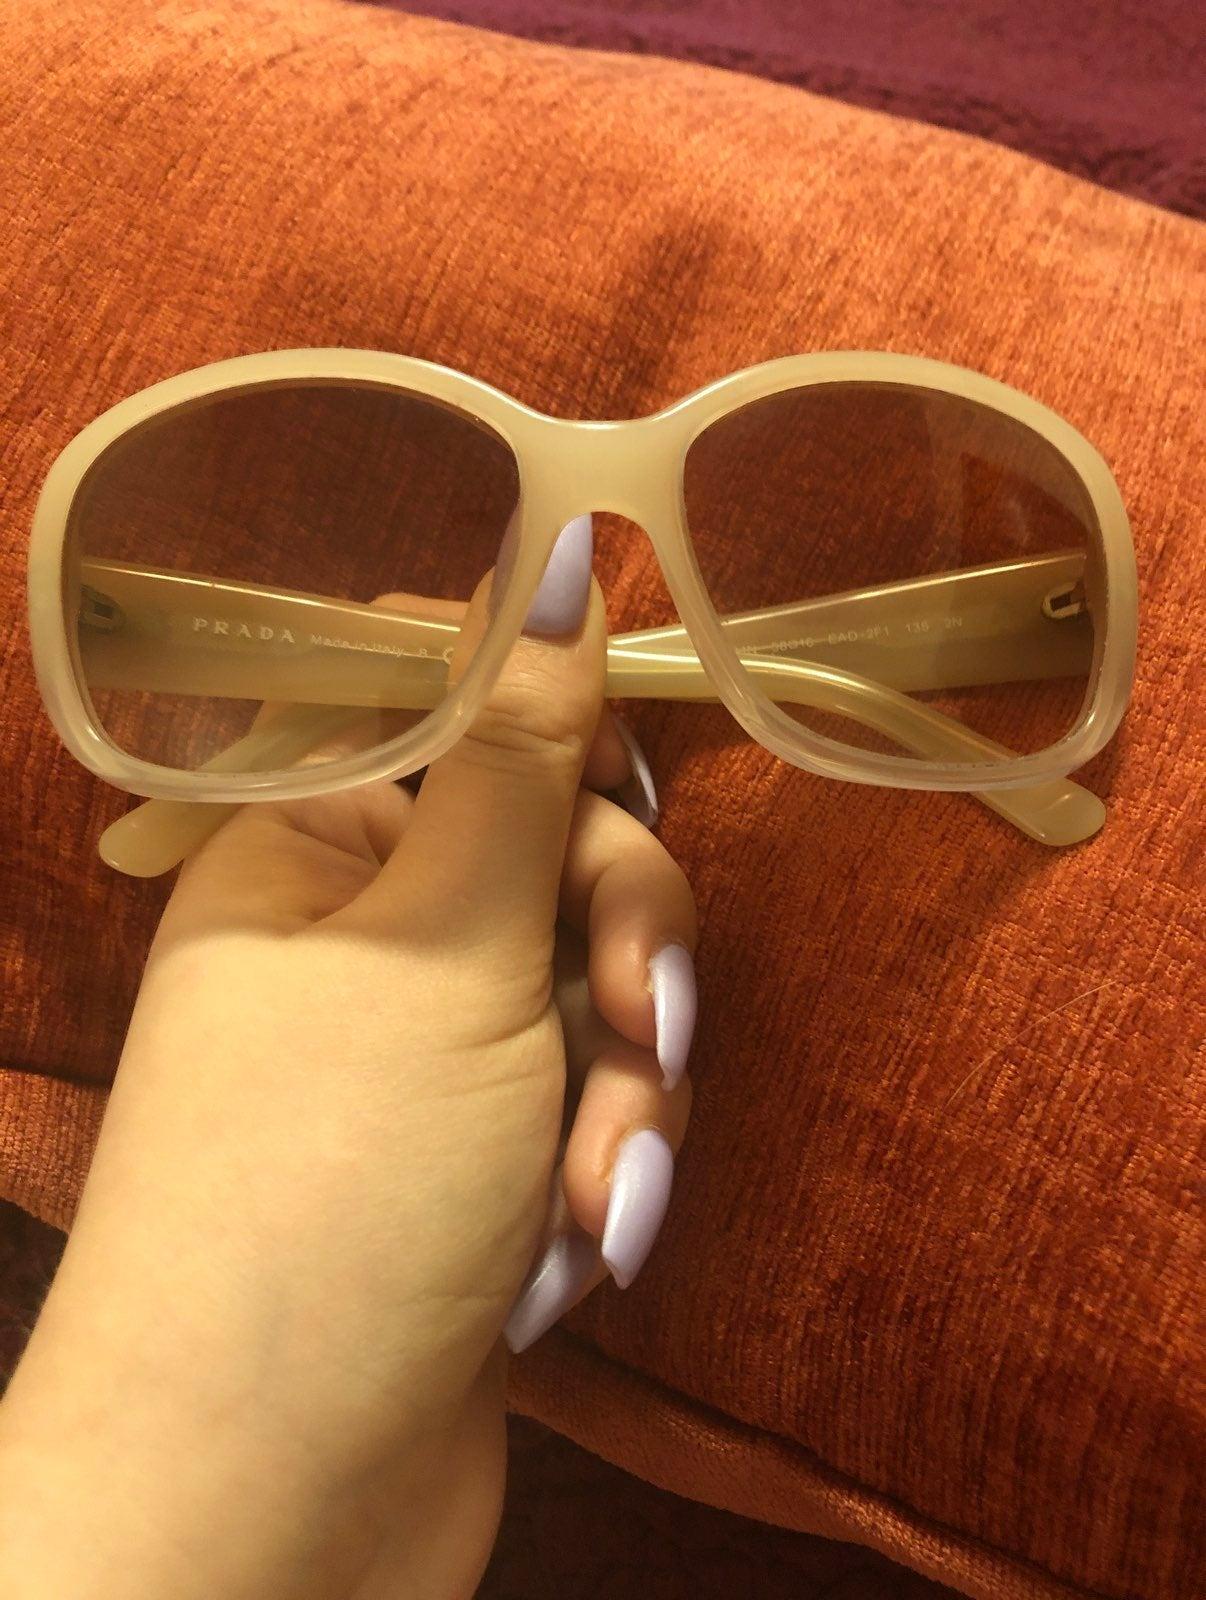 Prada beige/light pink sunglasses great